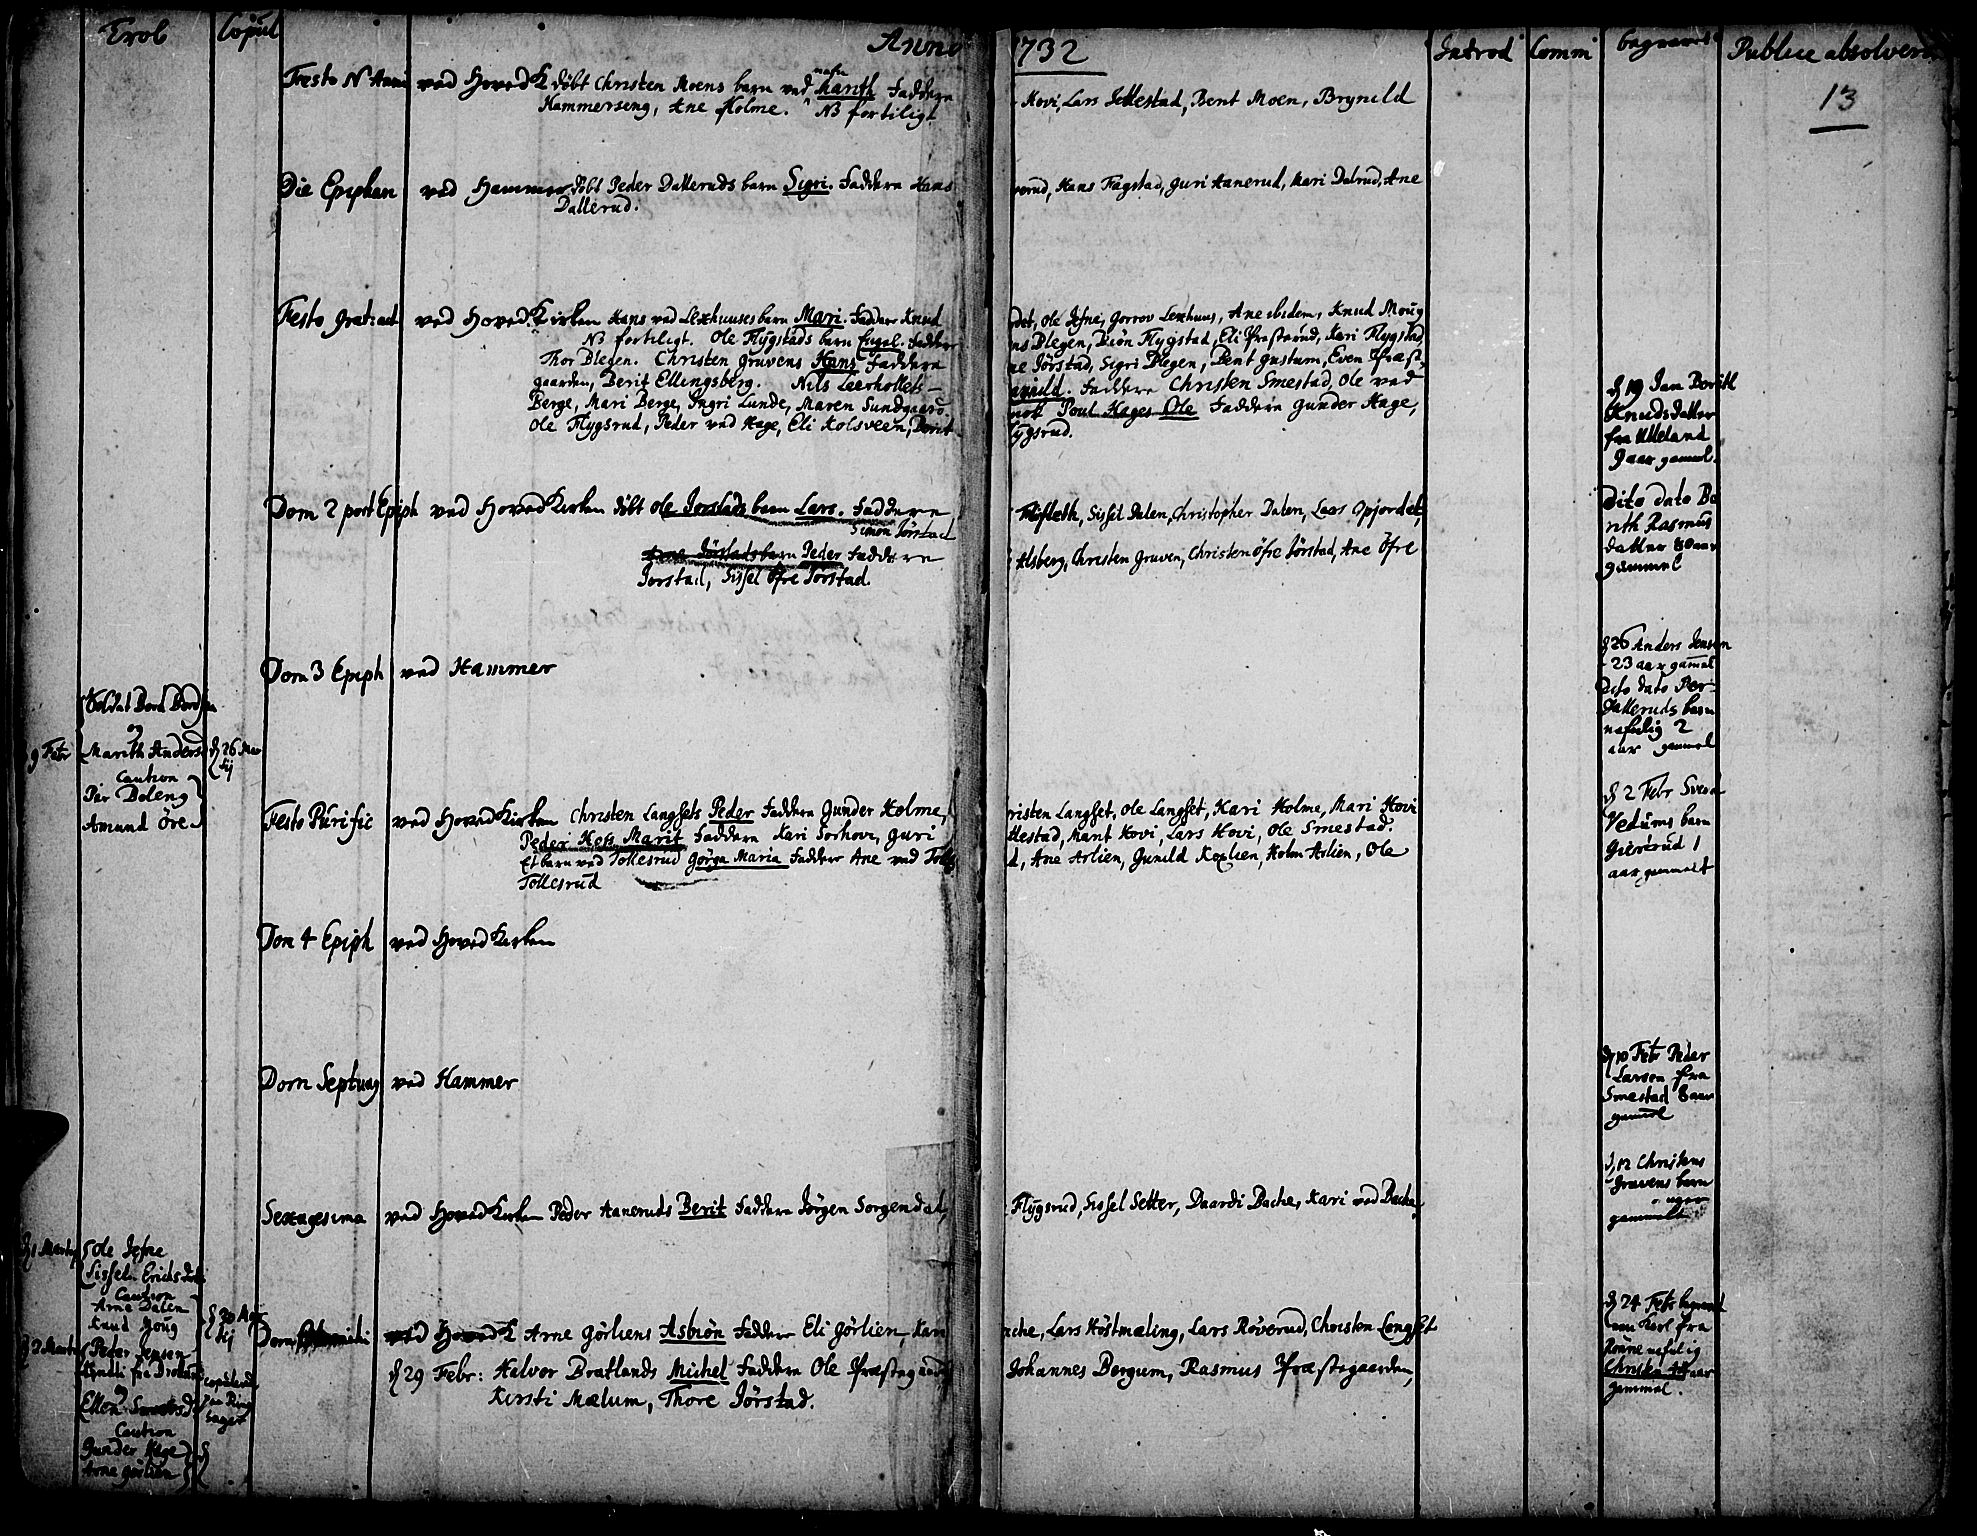 SAH, Fåberg prestekontor, Ministerialbok nr. 1, 1727-1775, s. 13